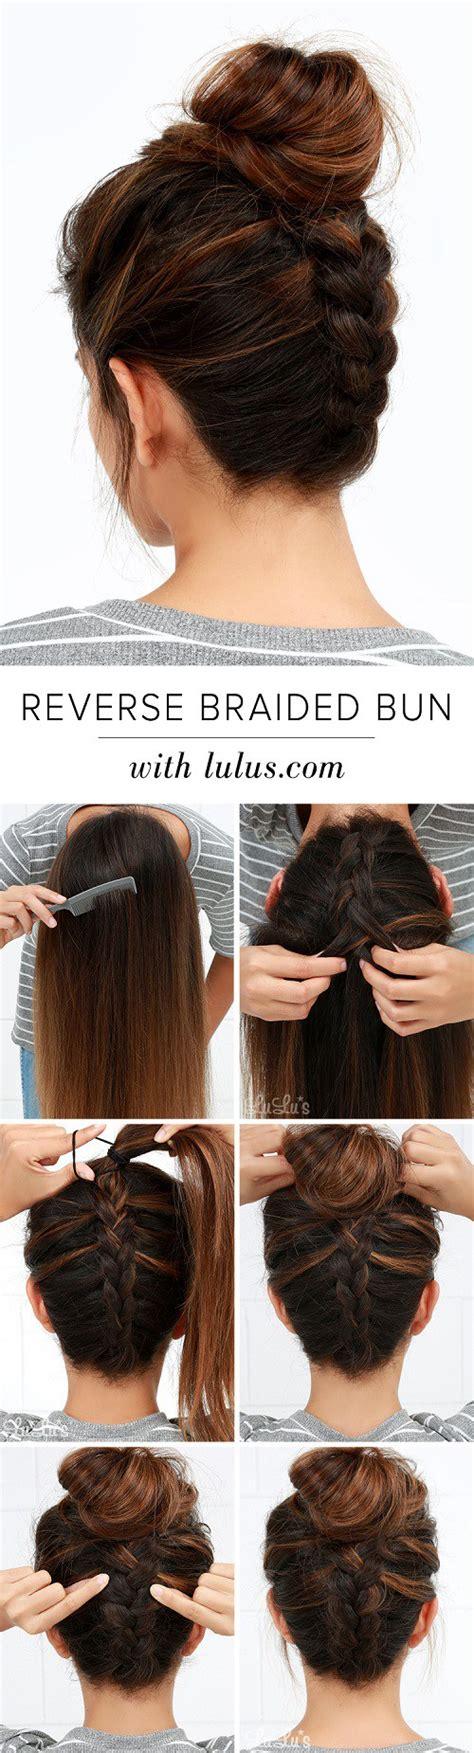 20 easy elegant step by step hair tutorials for long